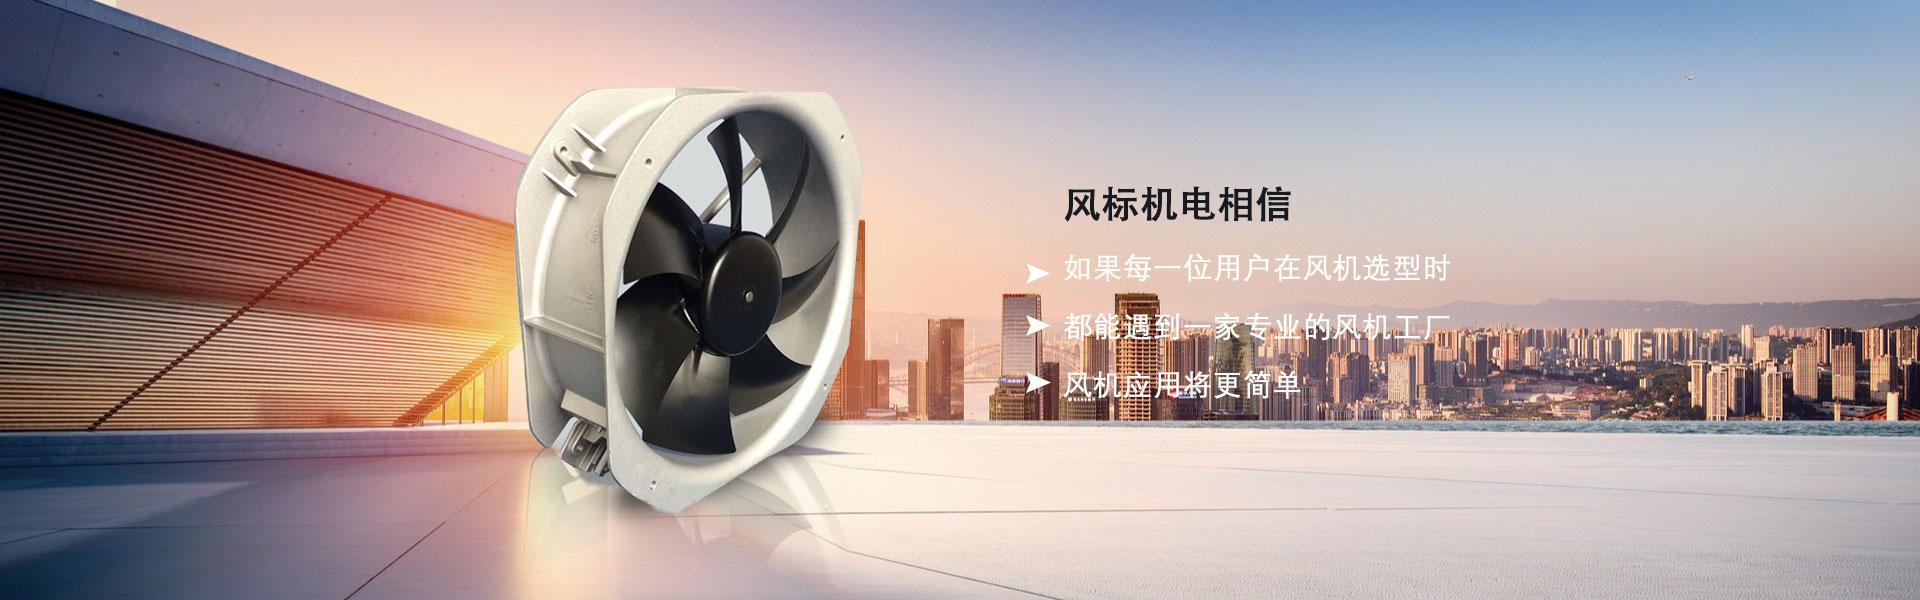 轴流风机 BLDC Axial Fan